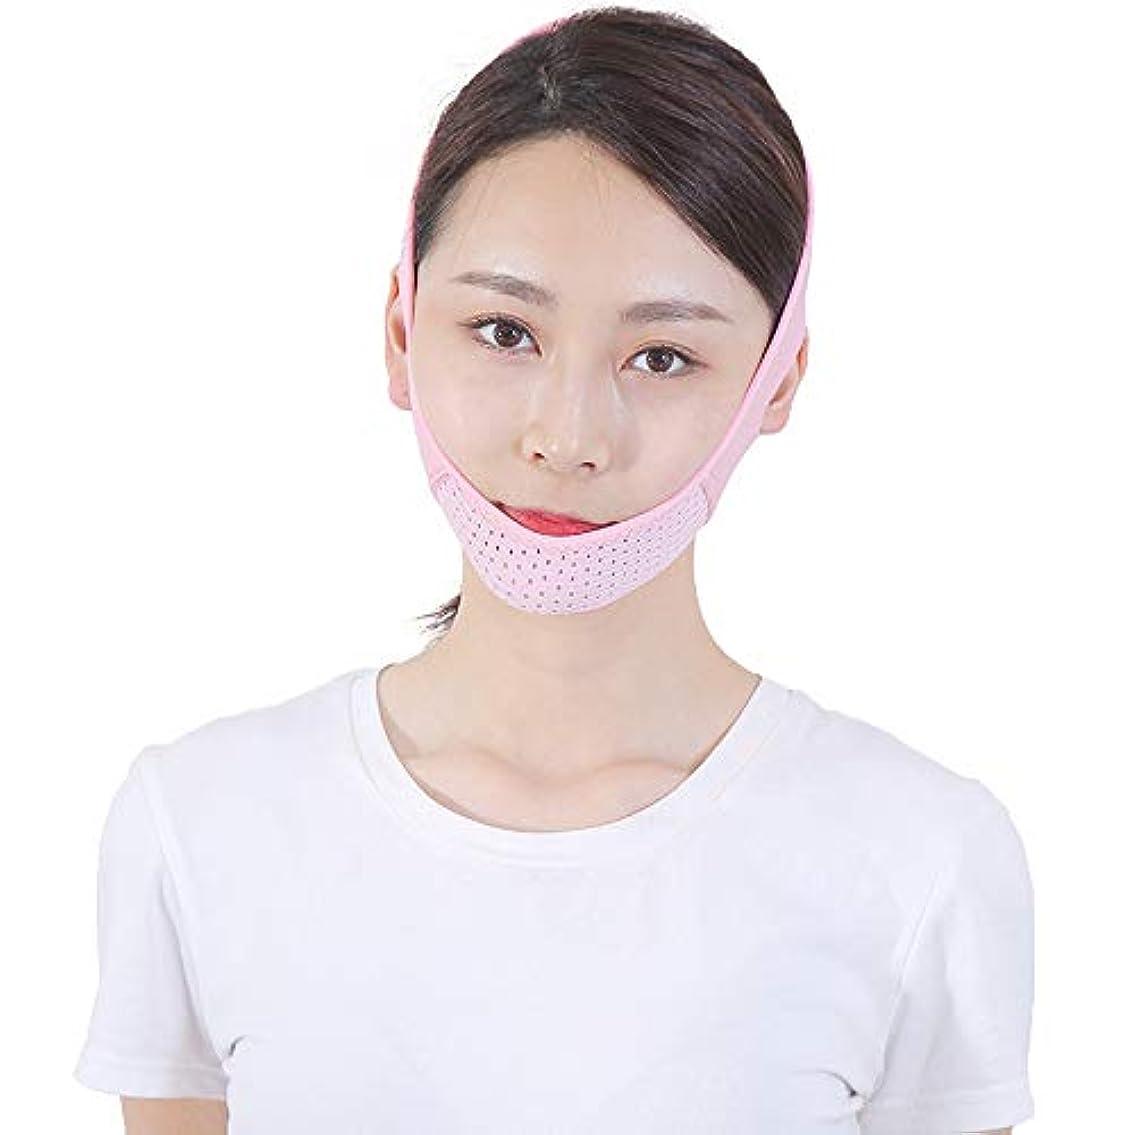 Minmin フェイシャルリフティング痩身ベルトフェイススリムゲットダブルチンアンチエイジングリンクルフェイスバンデージマスクシェイピングマスク顔を引き締めるダブルチンワークアウト みんみんVラインフェイスマスク